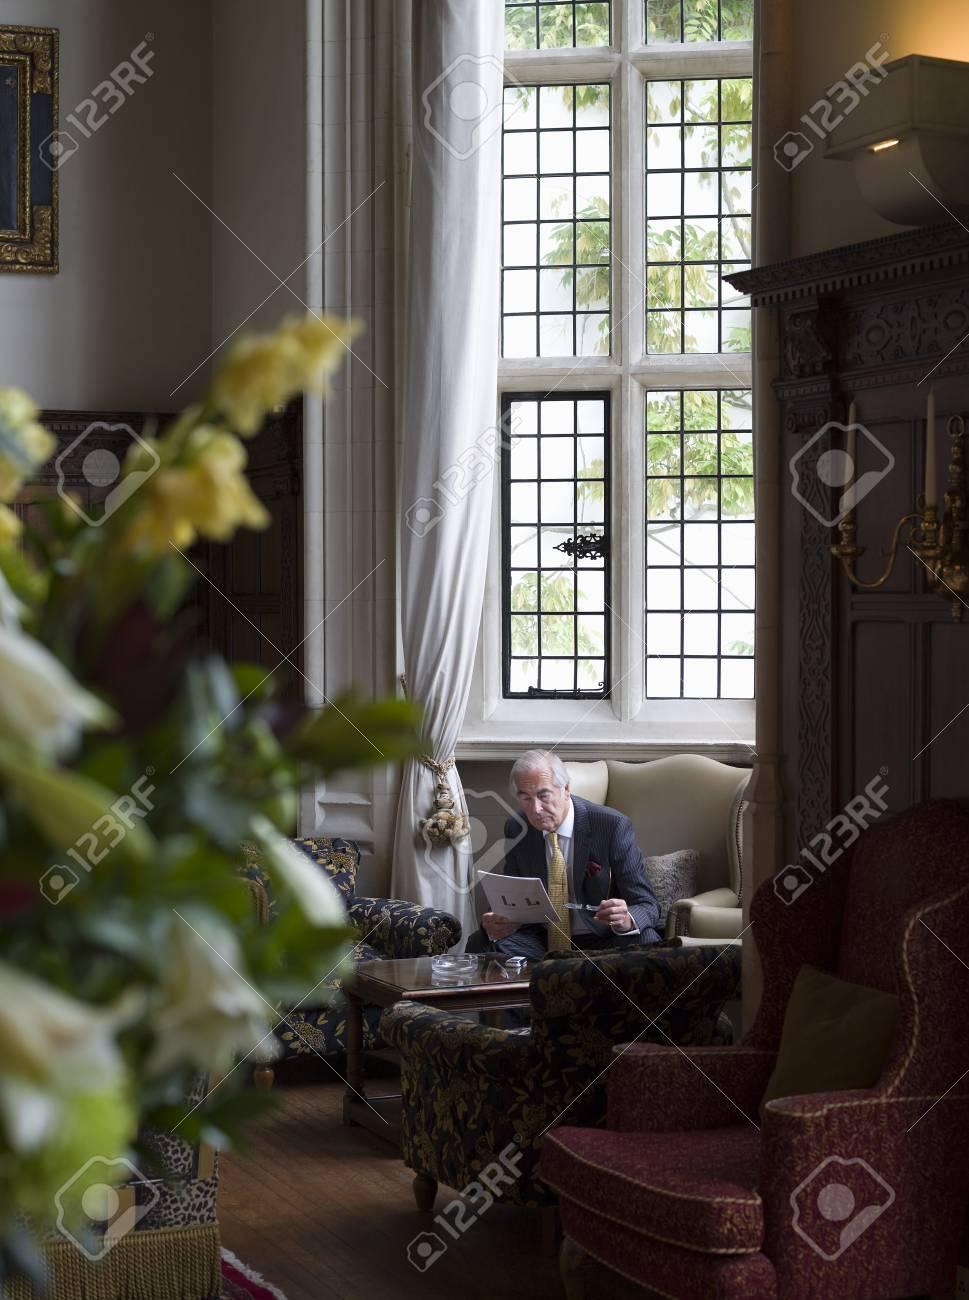 Senior man reading in interior with antique furniture Stock Photo - 19077712